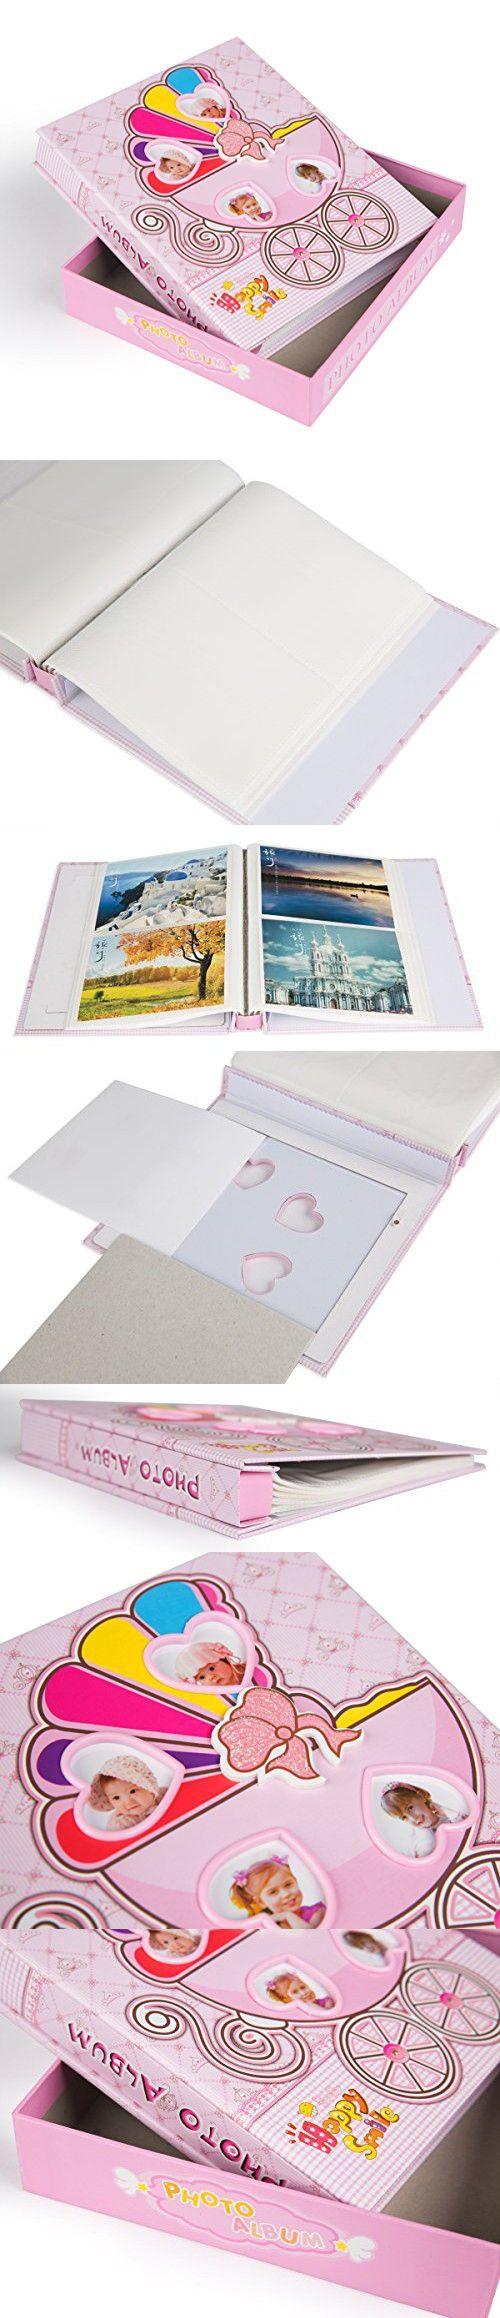 "FaCraft Baby Photo Album Holds 80 4x6 Photos ""Happy Smile"" Cute Album With Gift Storage Box (80,pink)"